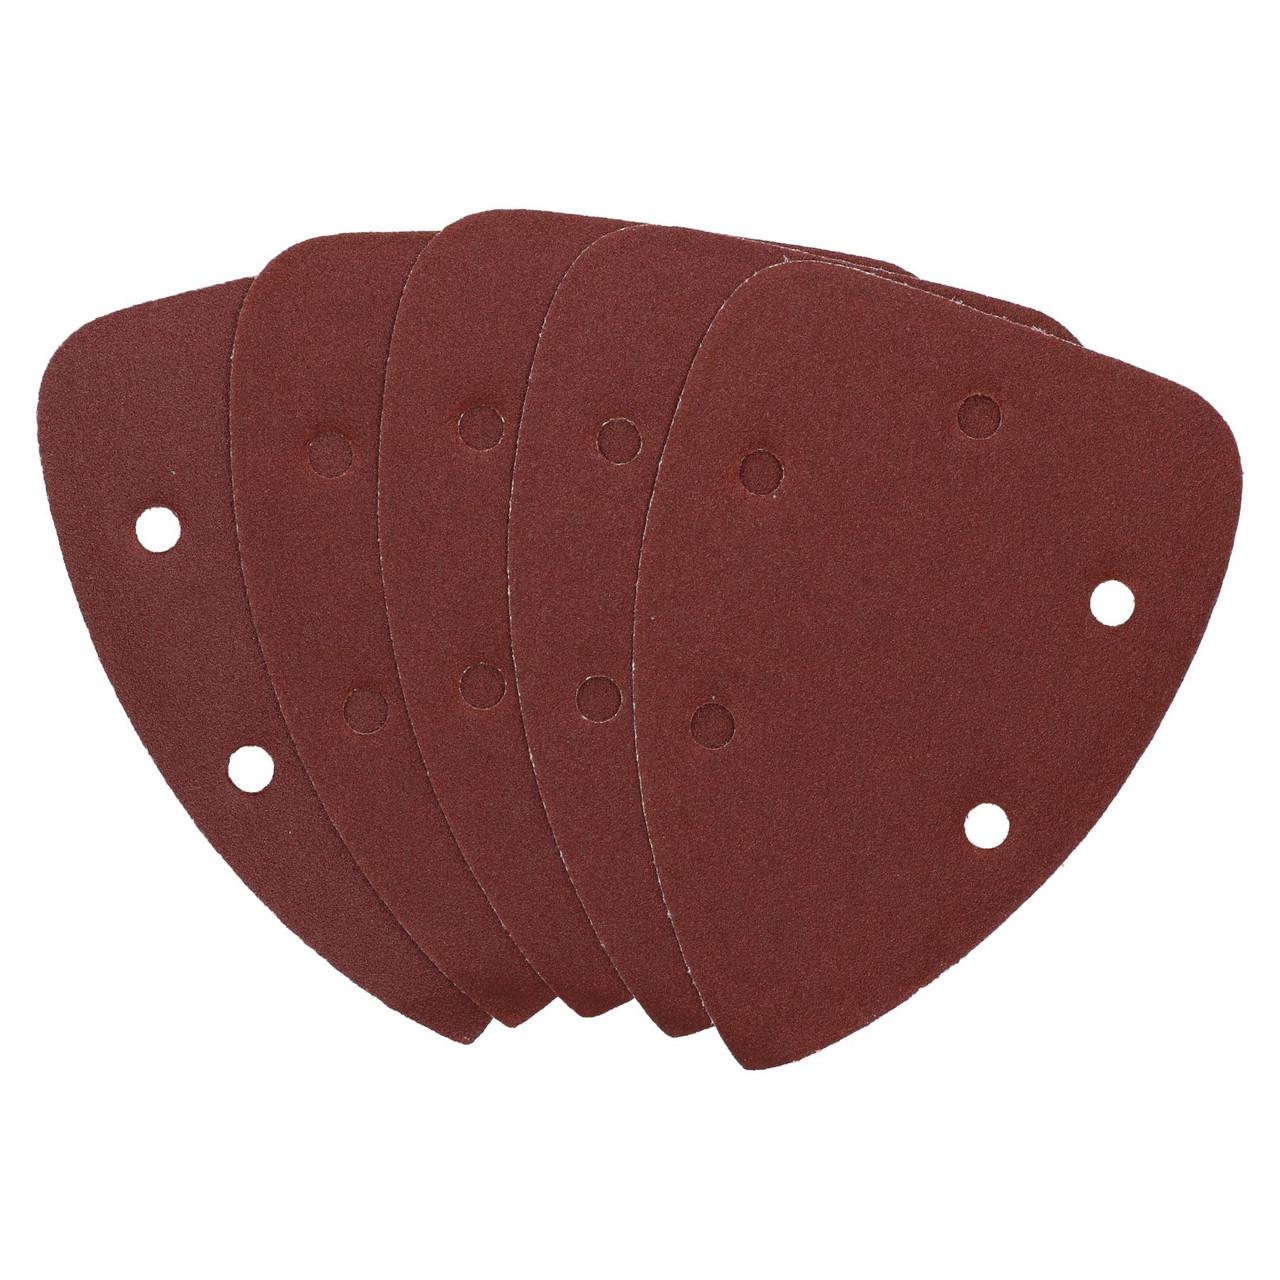 Hook And Loop Detail Sanding Pads Discs 140mm Triangular 80 Grit Medium 200pc